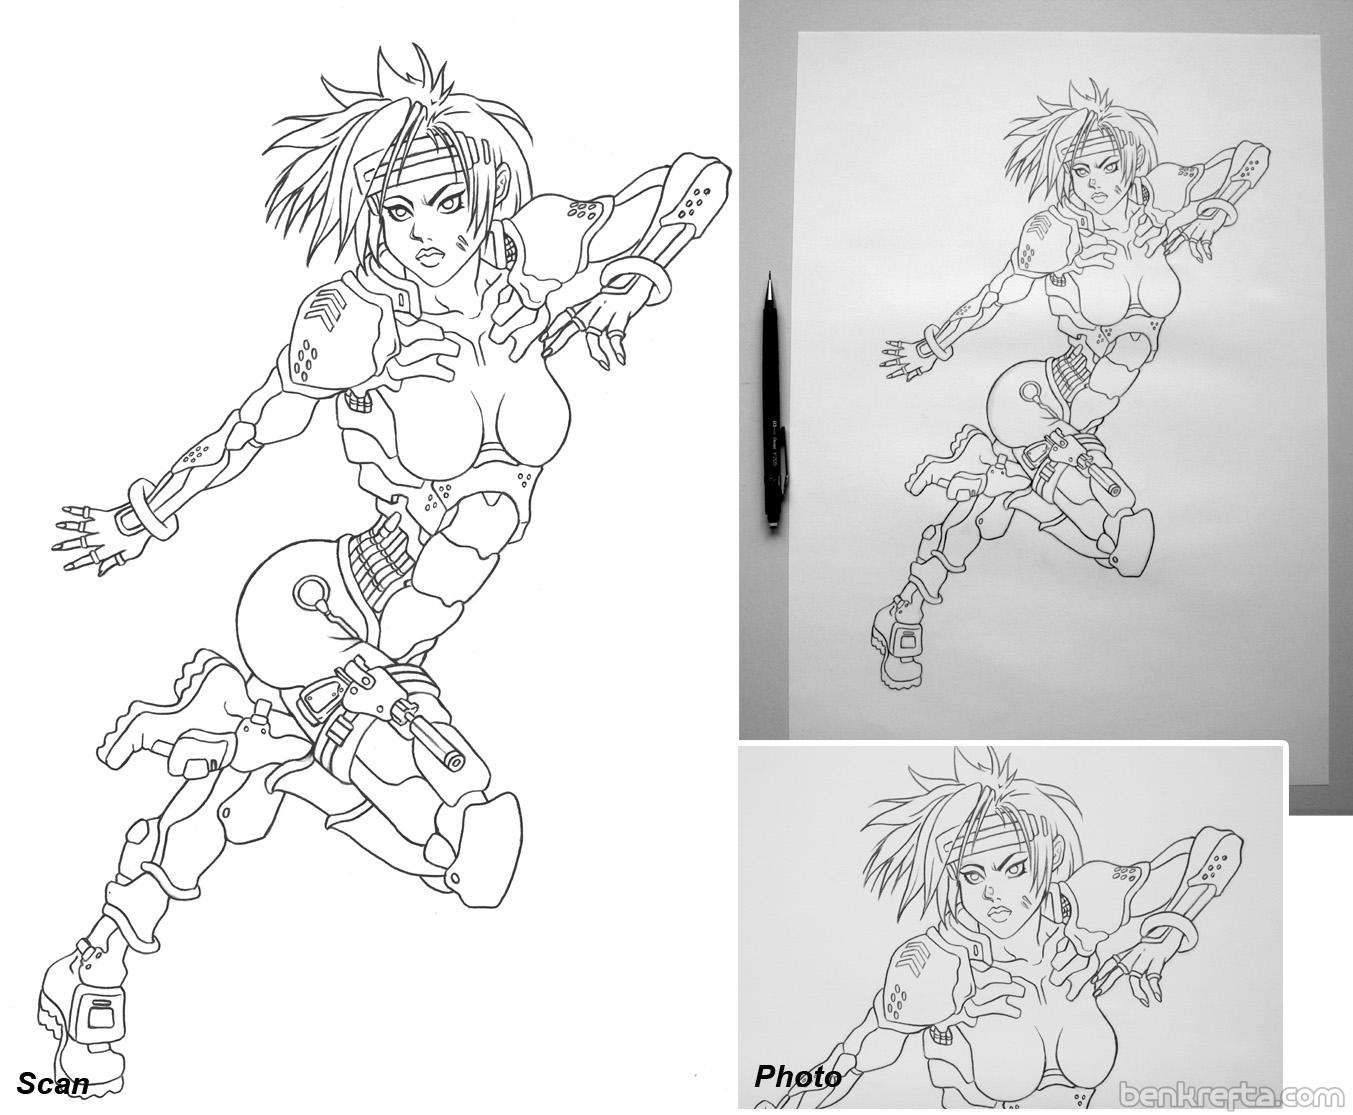 Cyber girl art